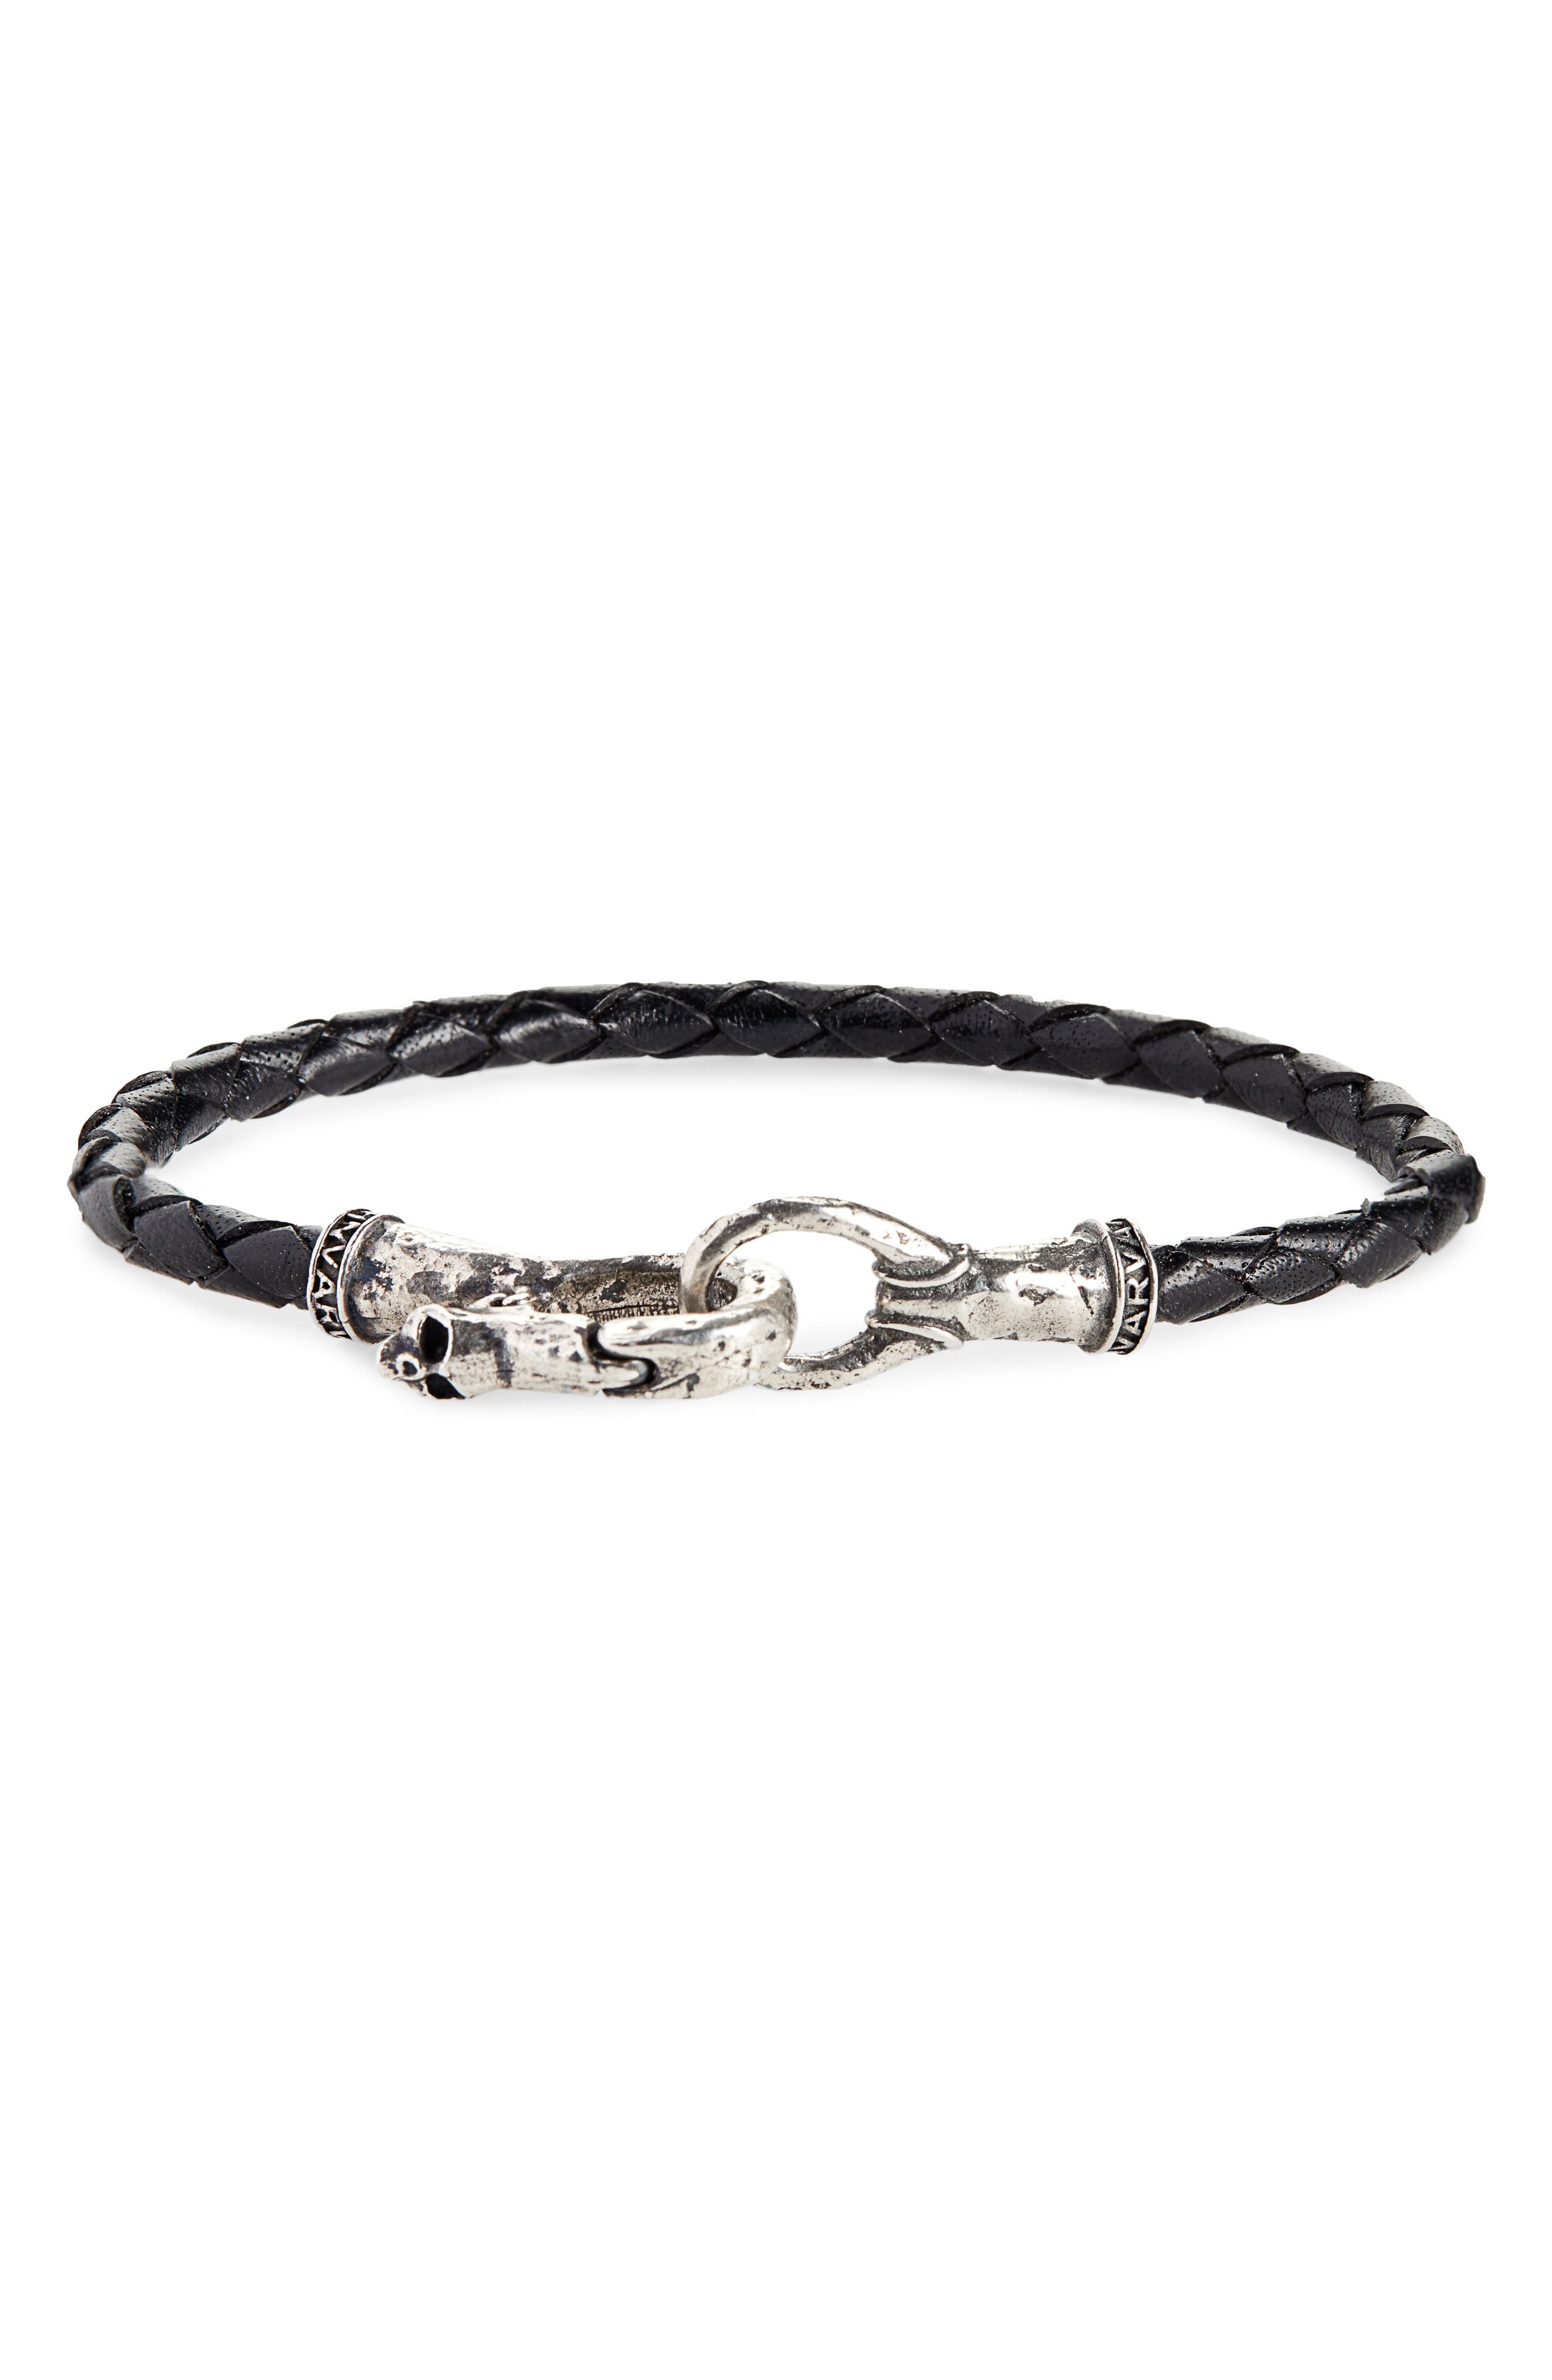 JOHN VARVATOS Braided Leather Bracelet, Main, color, BLACK